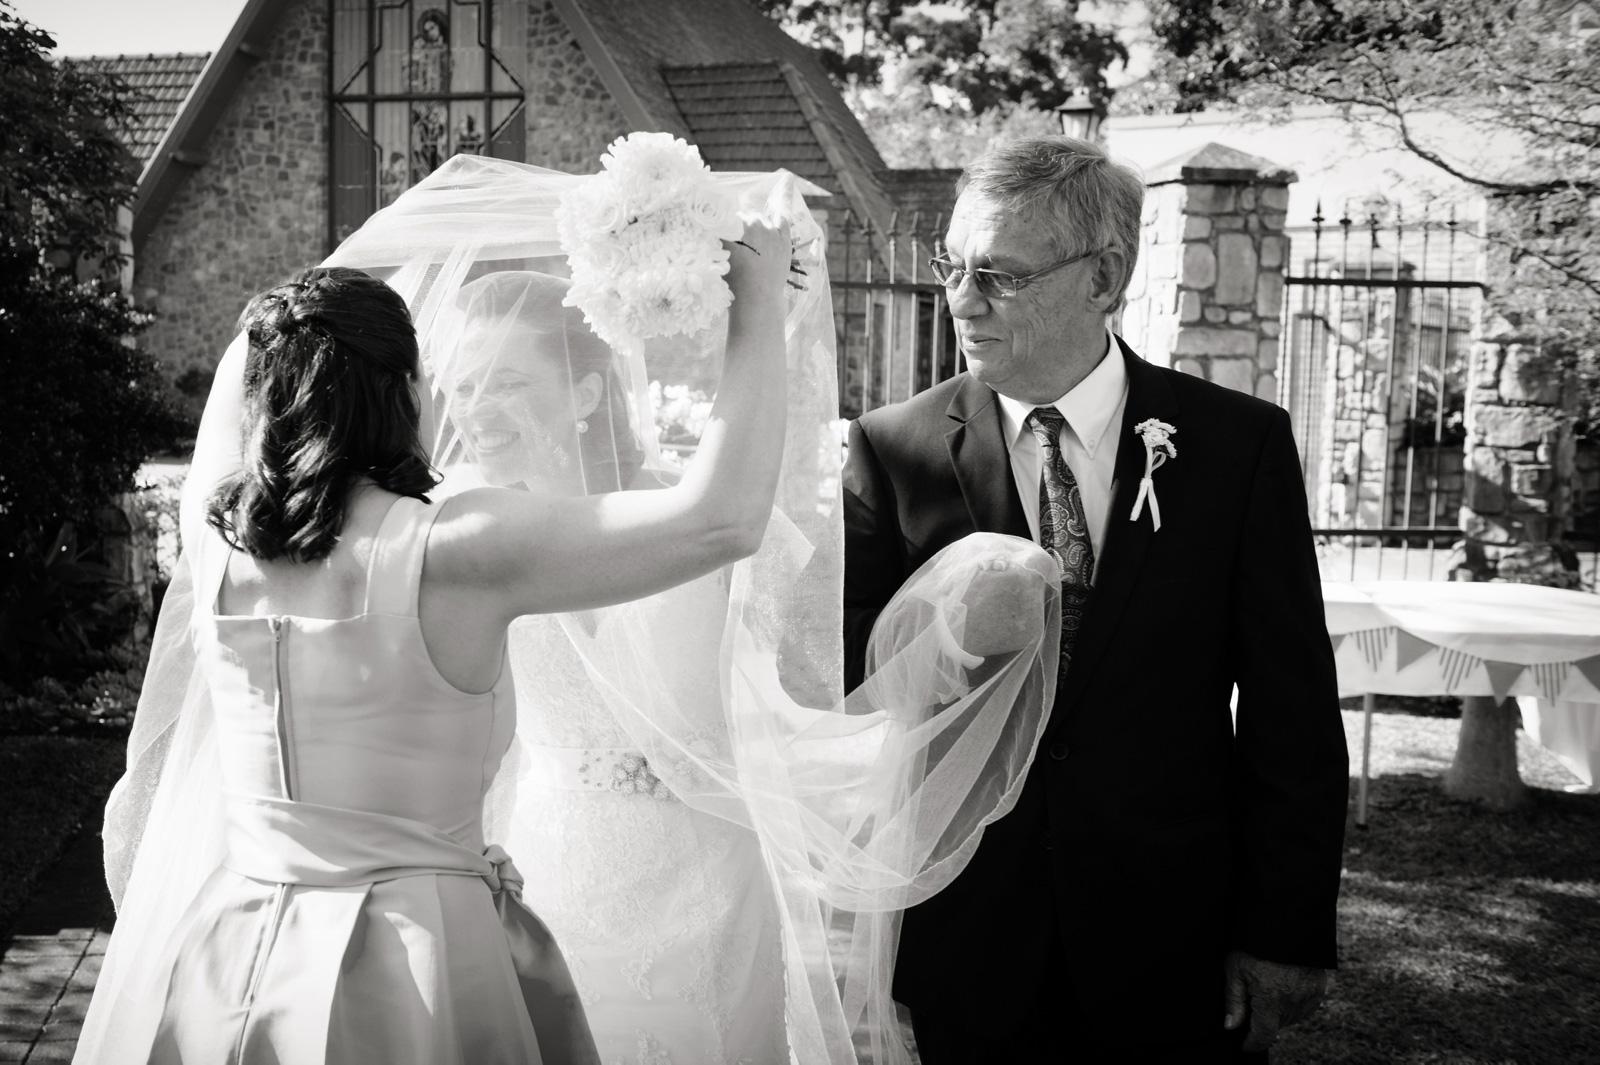 Talloula Documentary Wedding Photography Ceremony